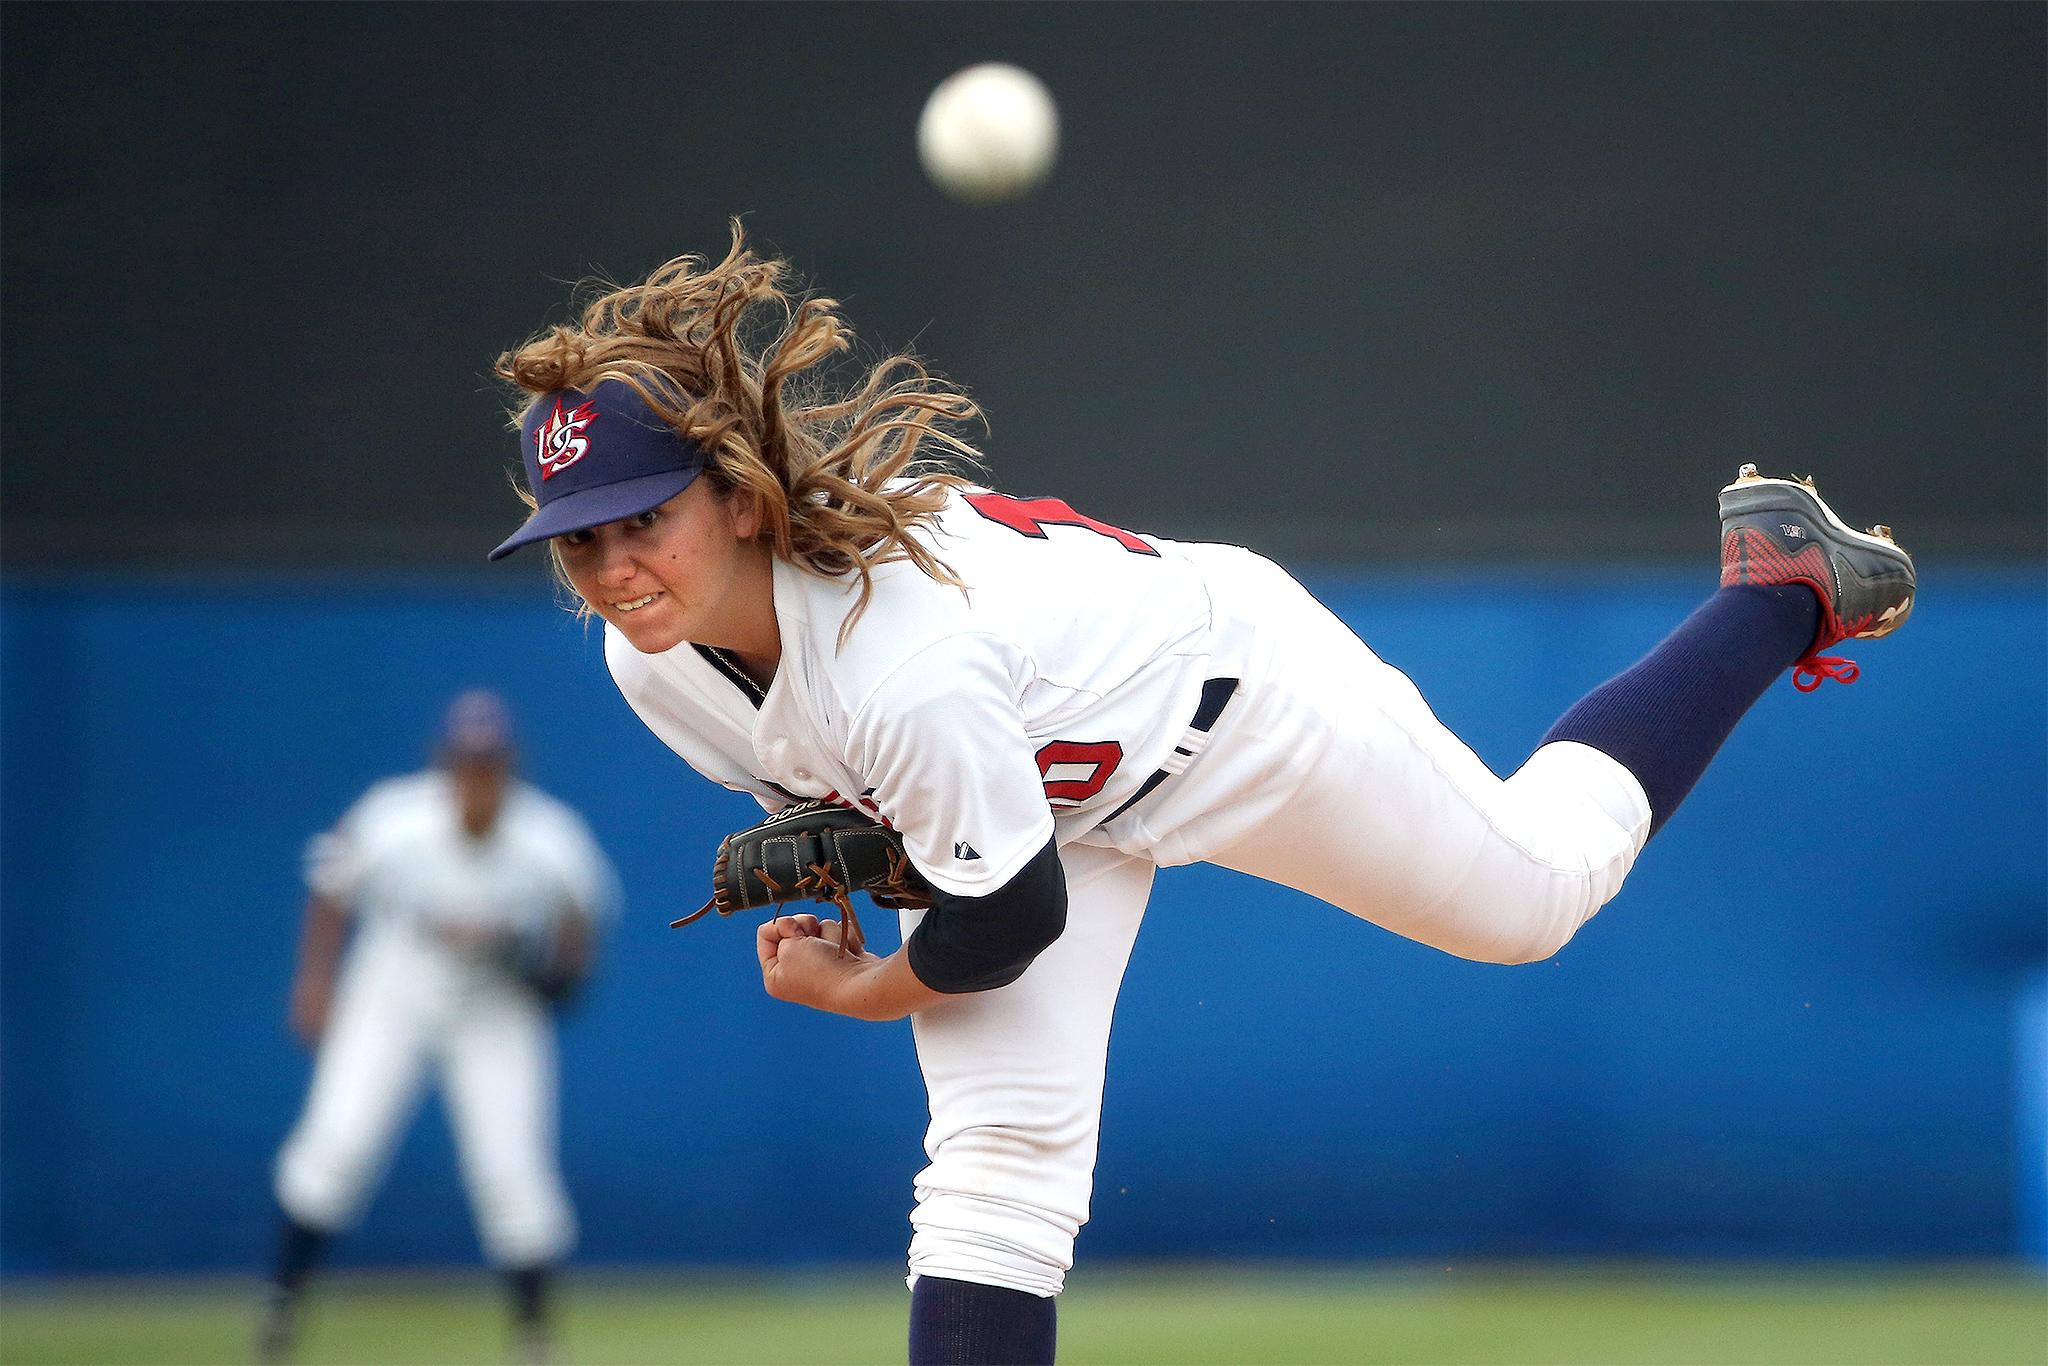 Women's baseball takes center stage